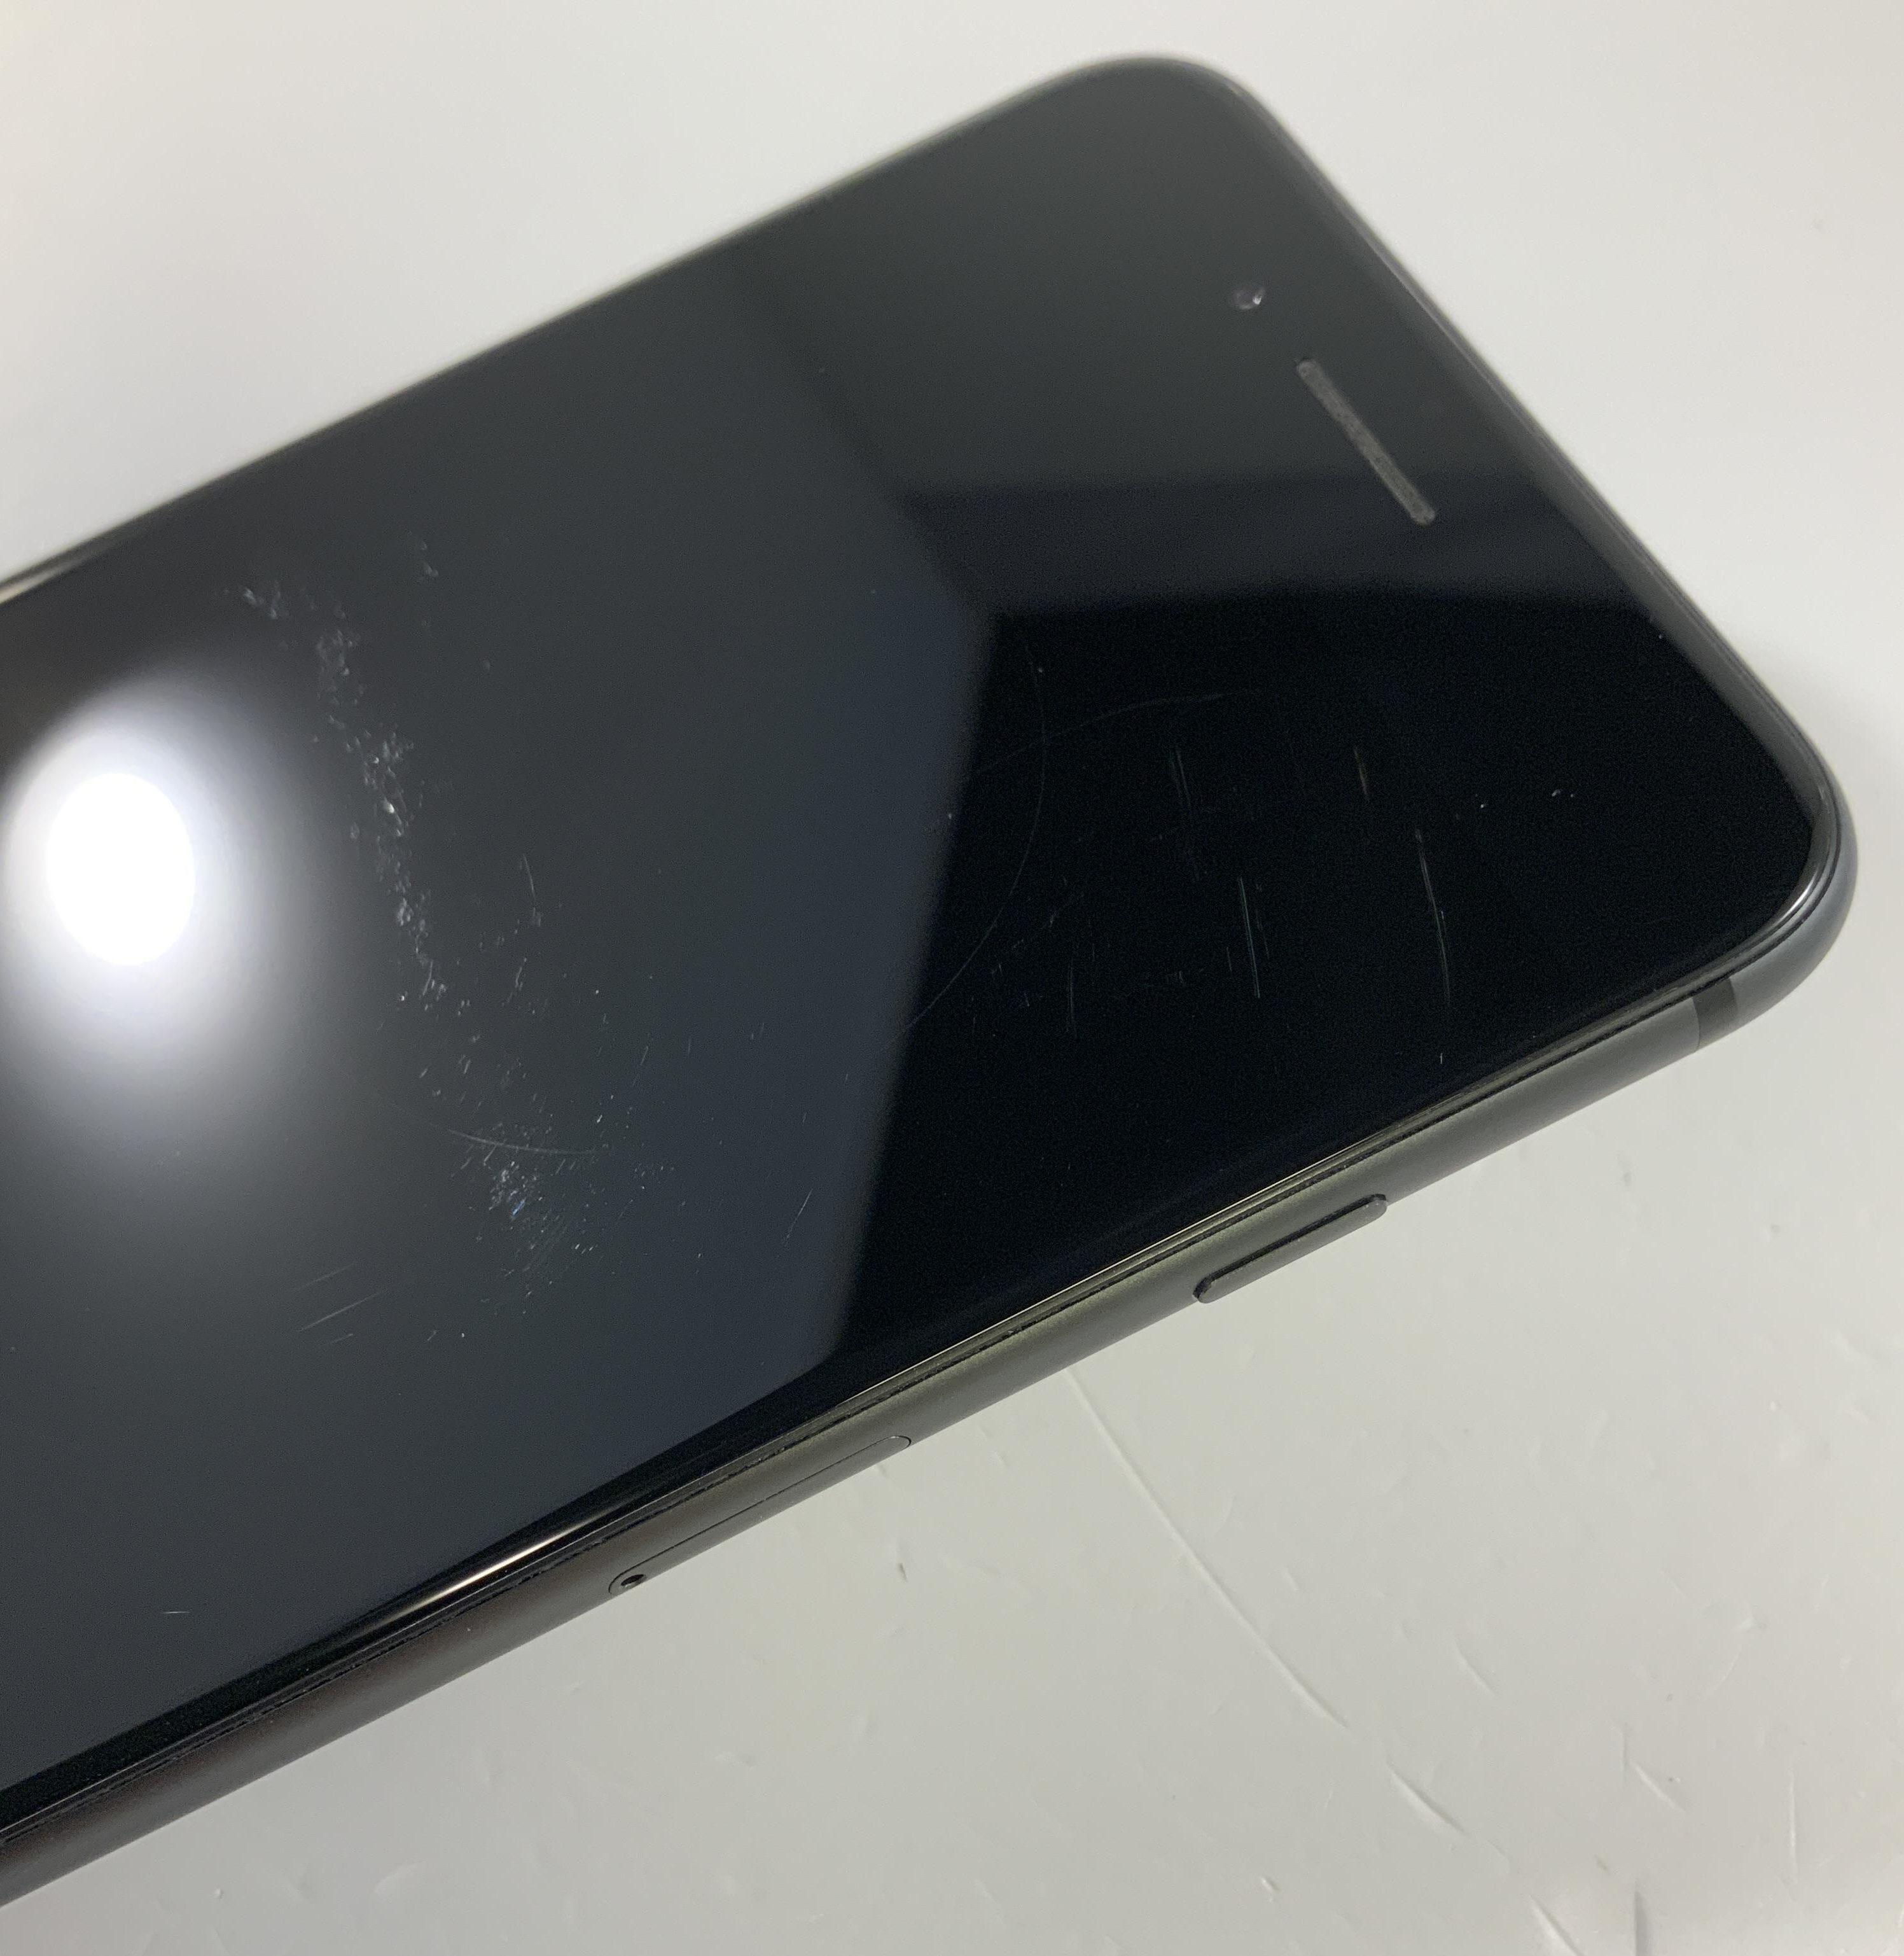 iPhone 8 Plus 256GB, 256GB, Space Gray, obraz 4